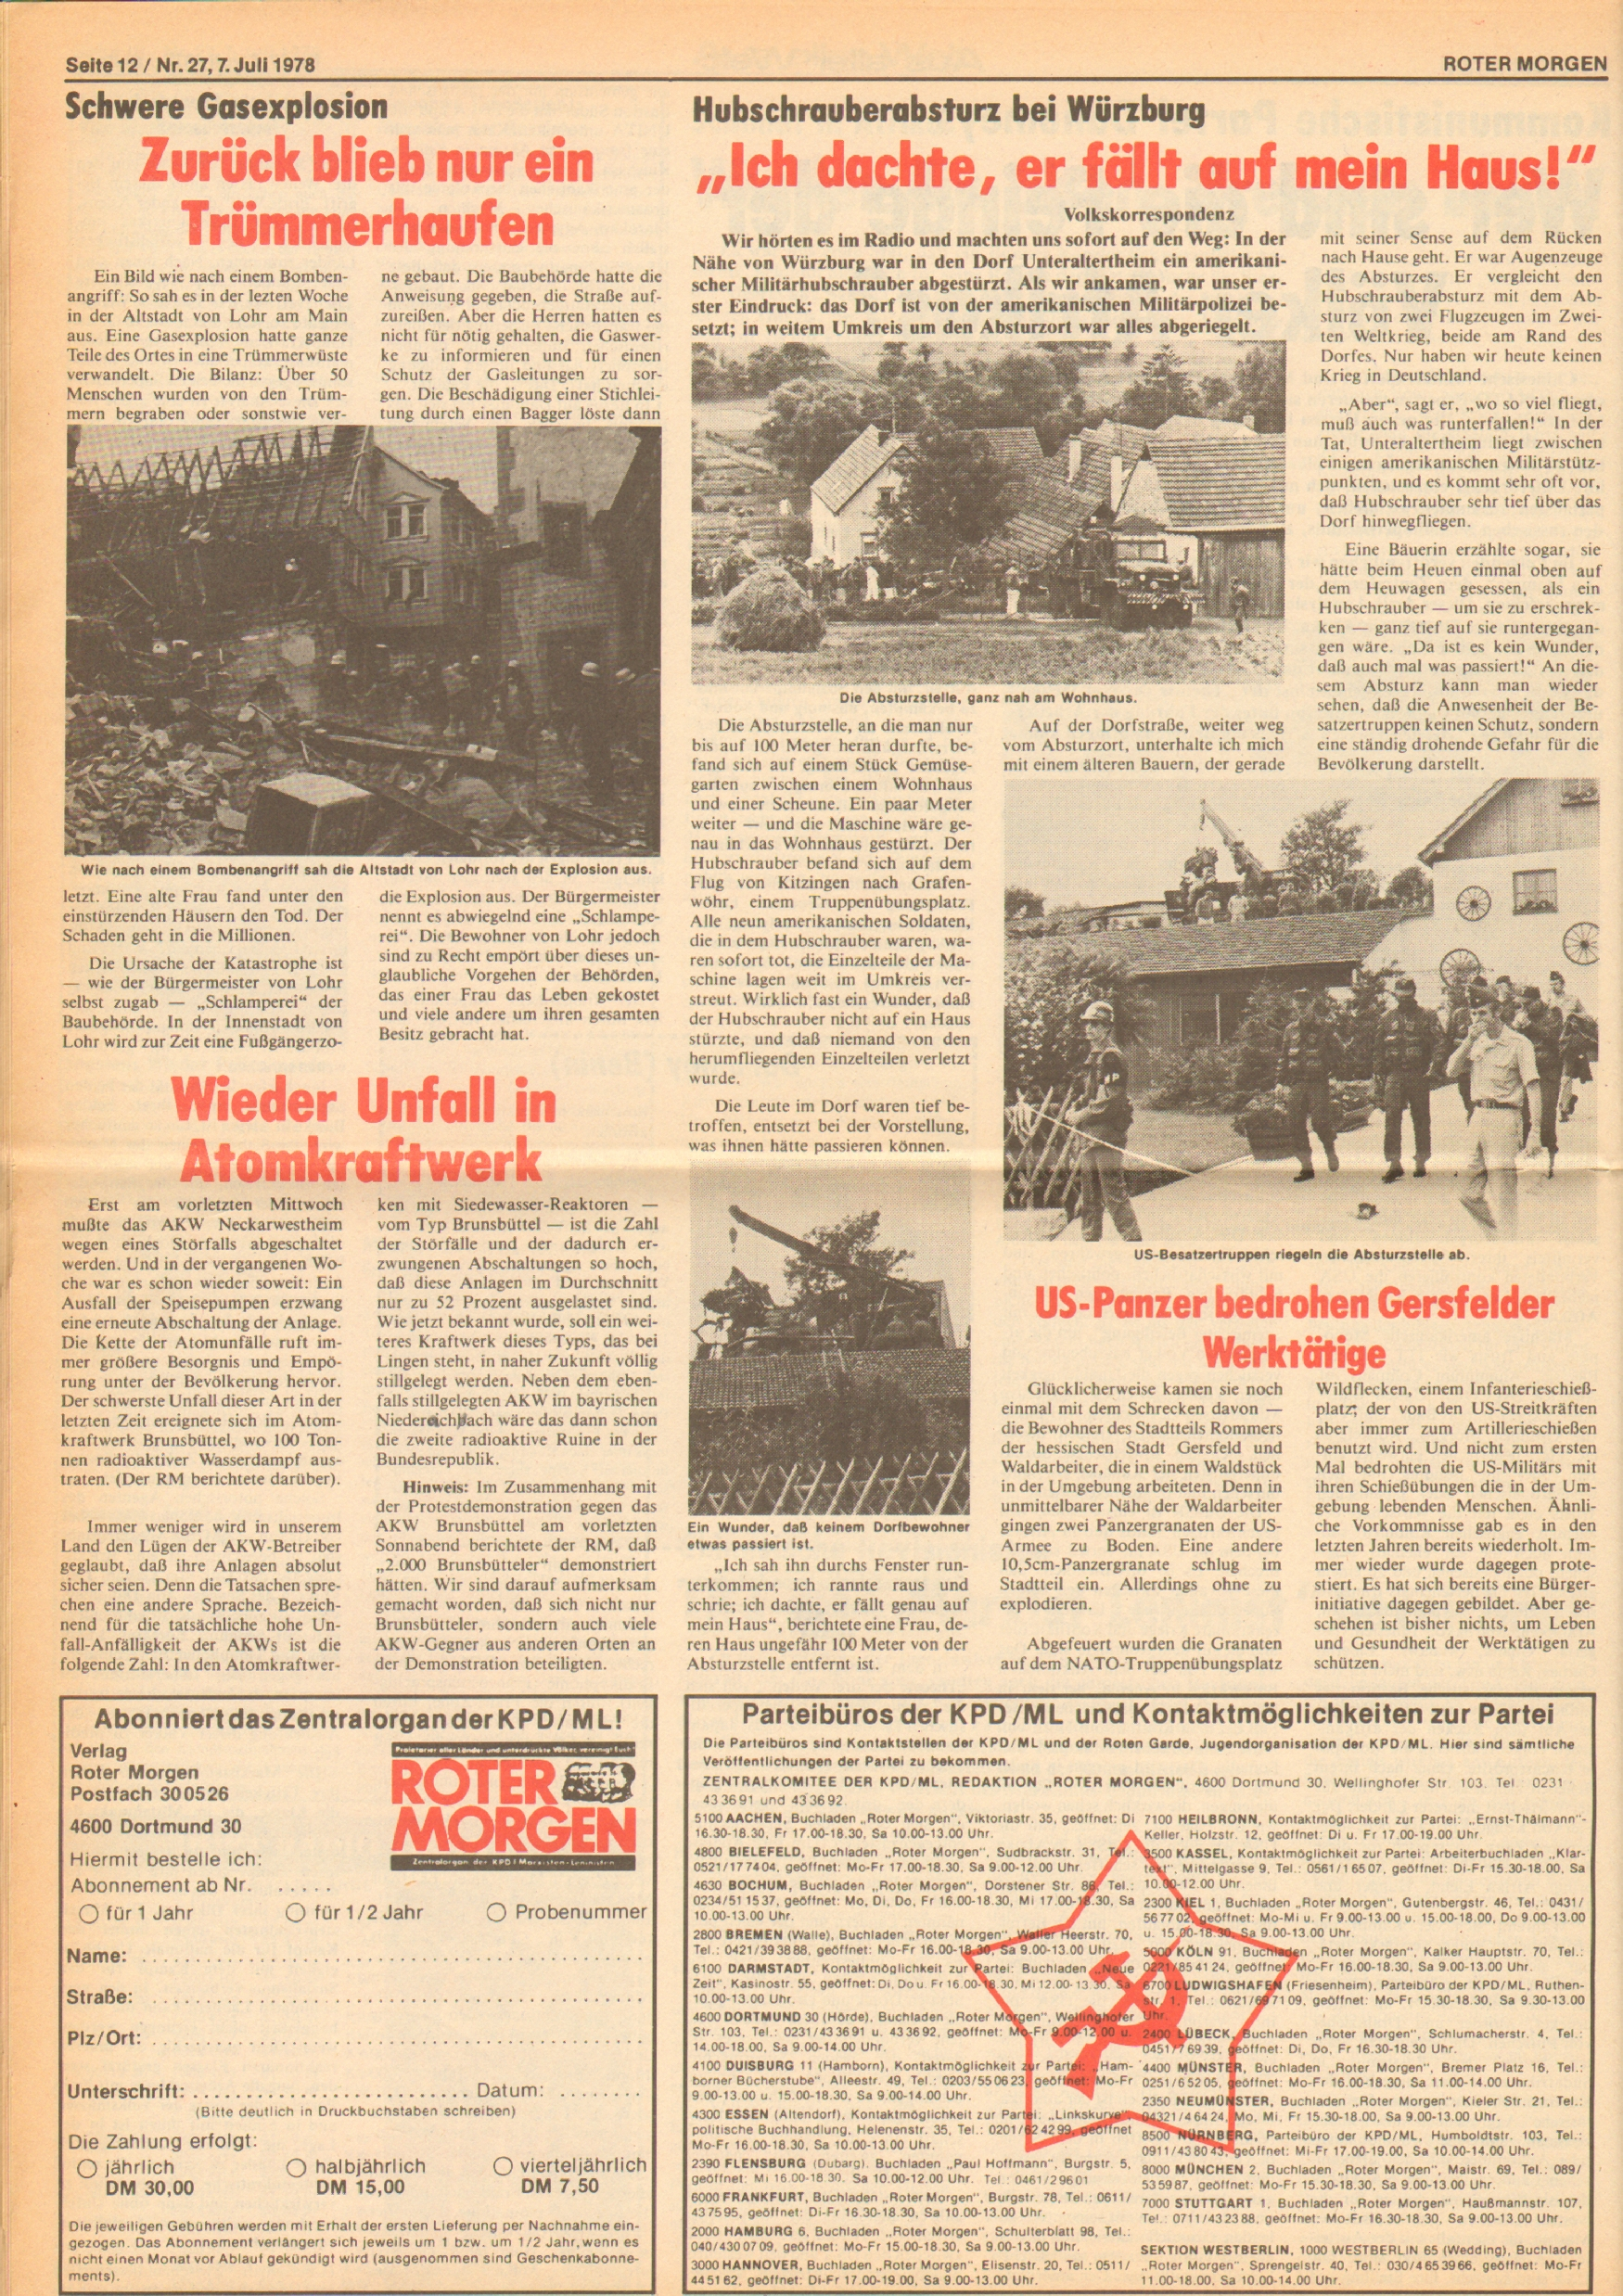 Roter Morgen, 12. Jg., 7. Juli 1978, Nr. 27, Seite 12